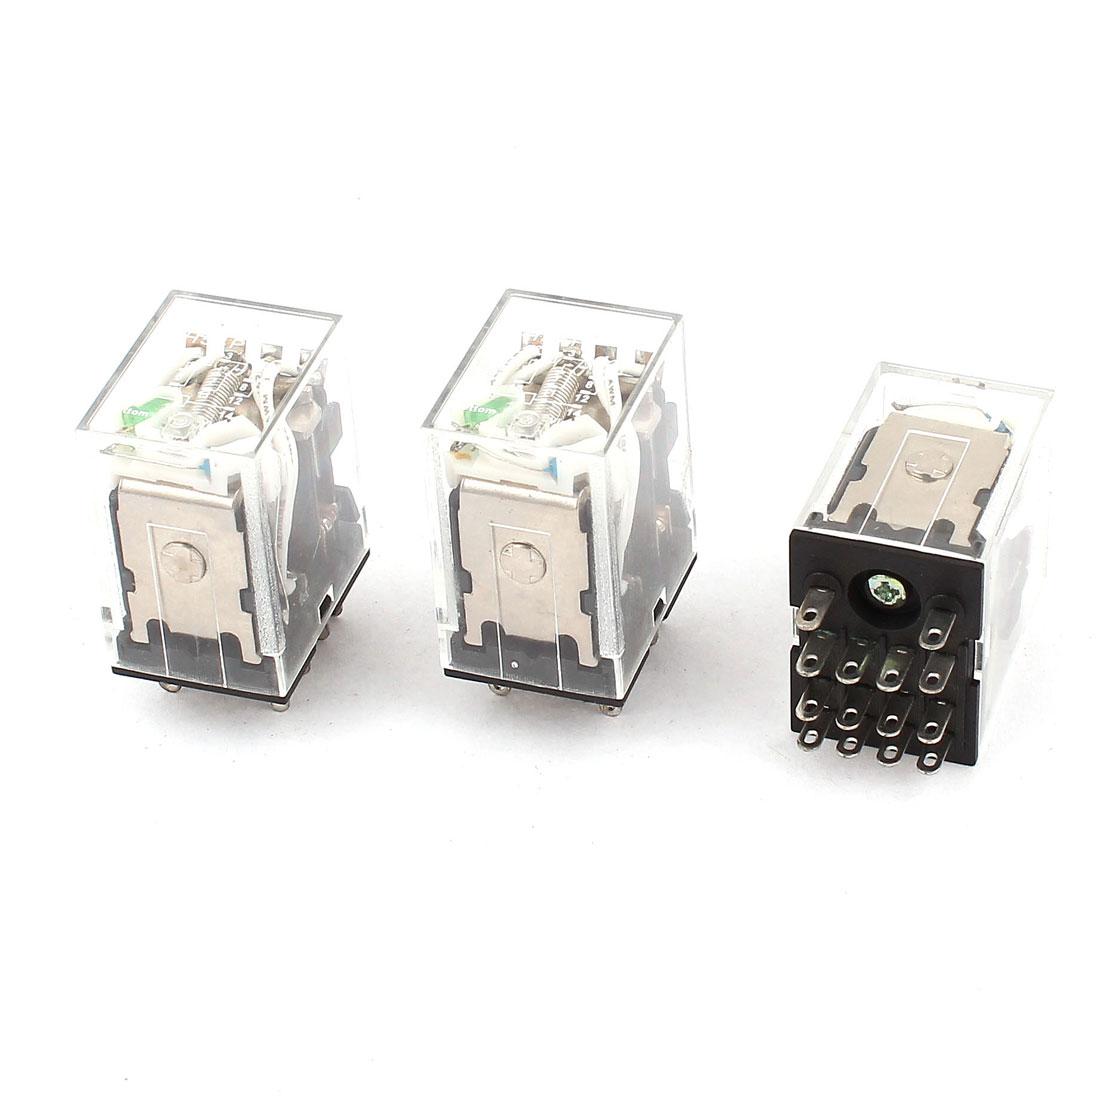 HH54PL 11Pins 3PDT DC 24V Coil Voltage Green LED Pilot Lamp Power Relay 3 Pieces